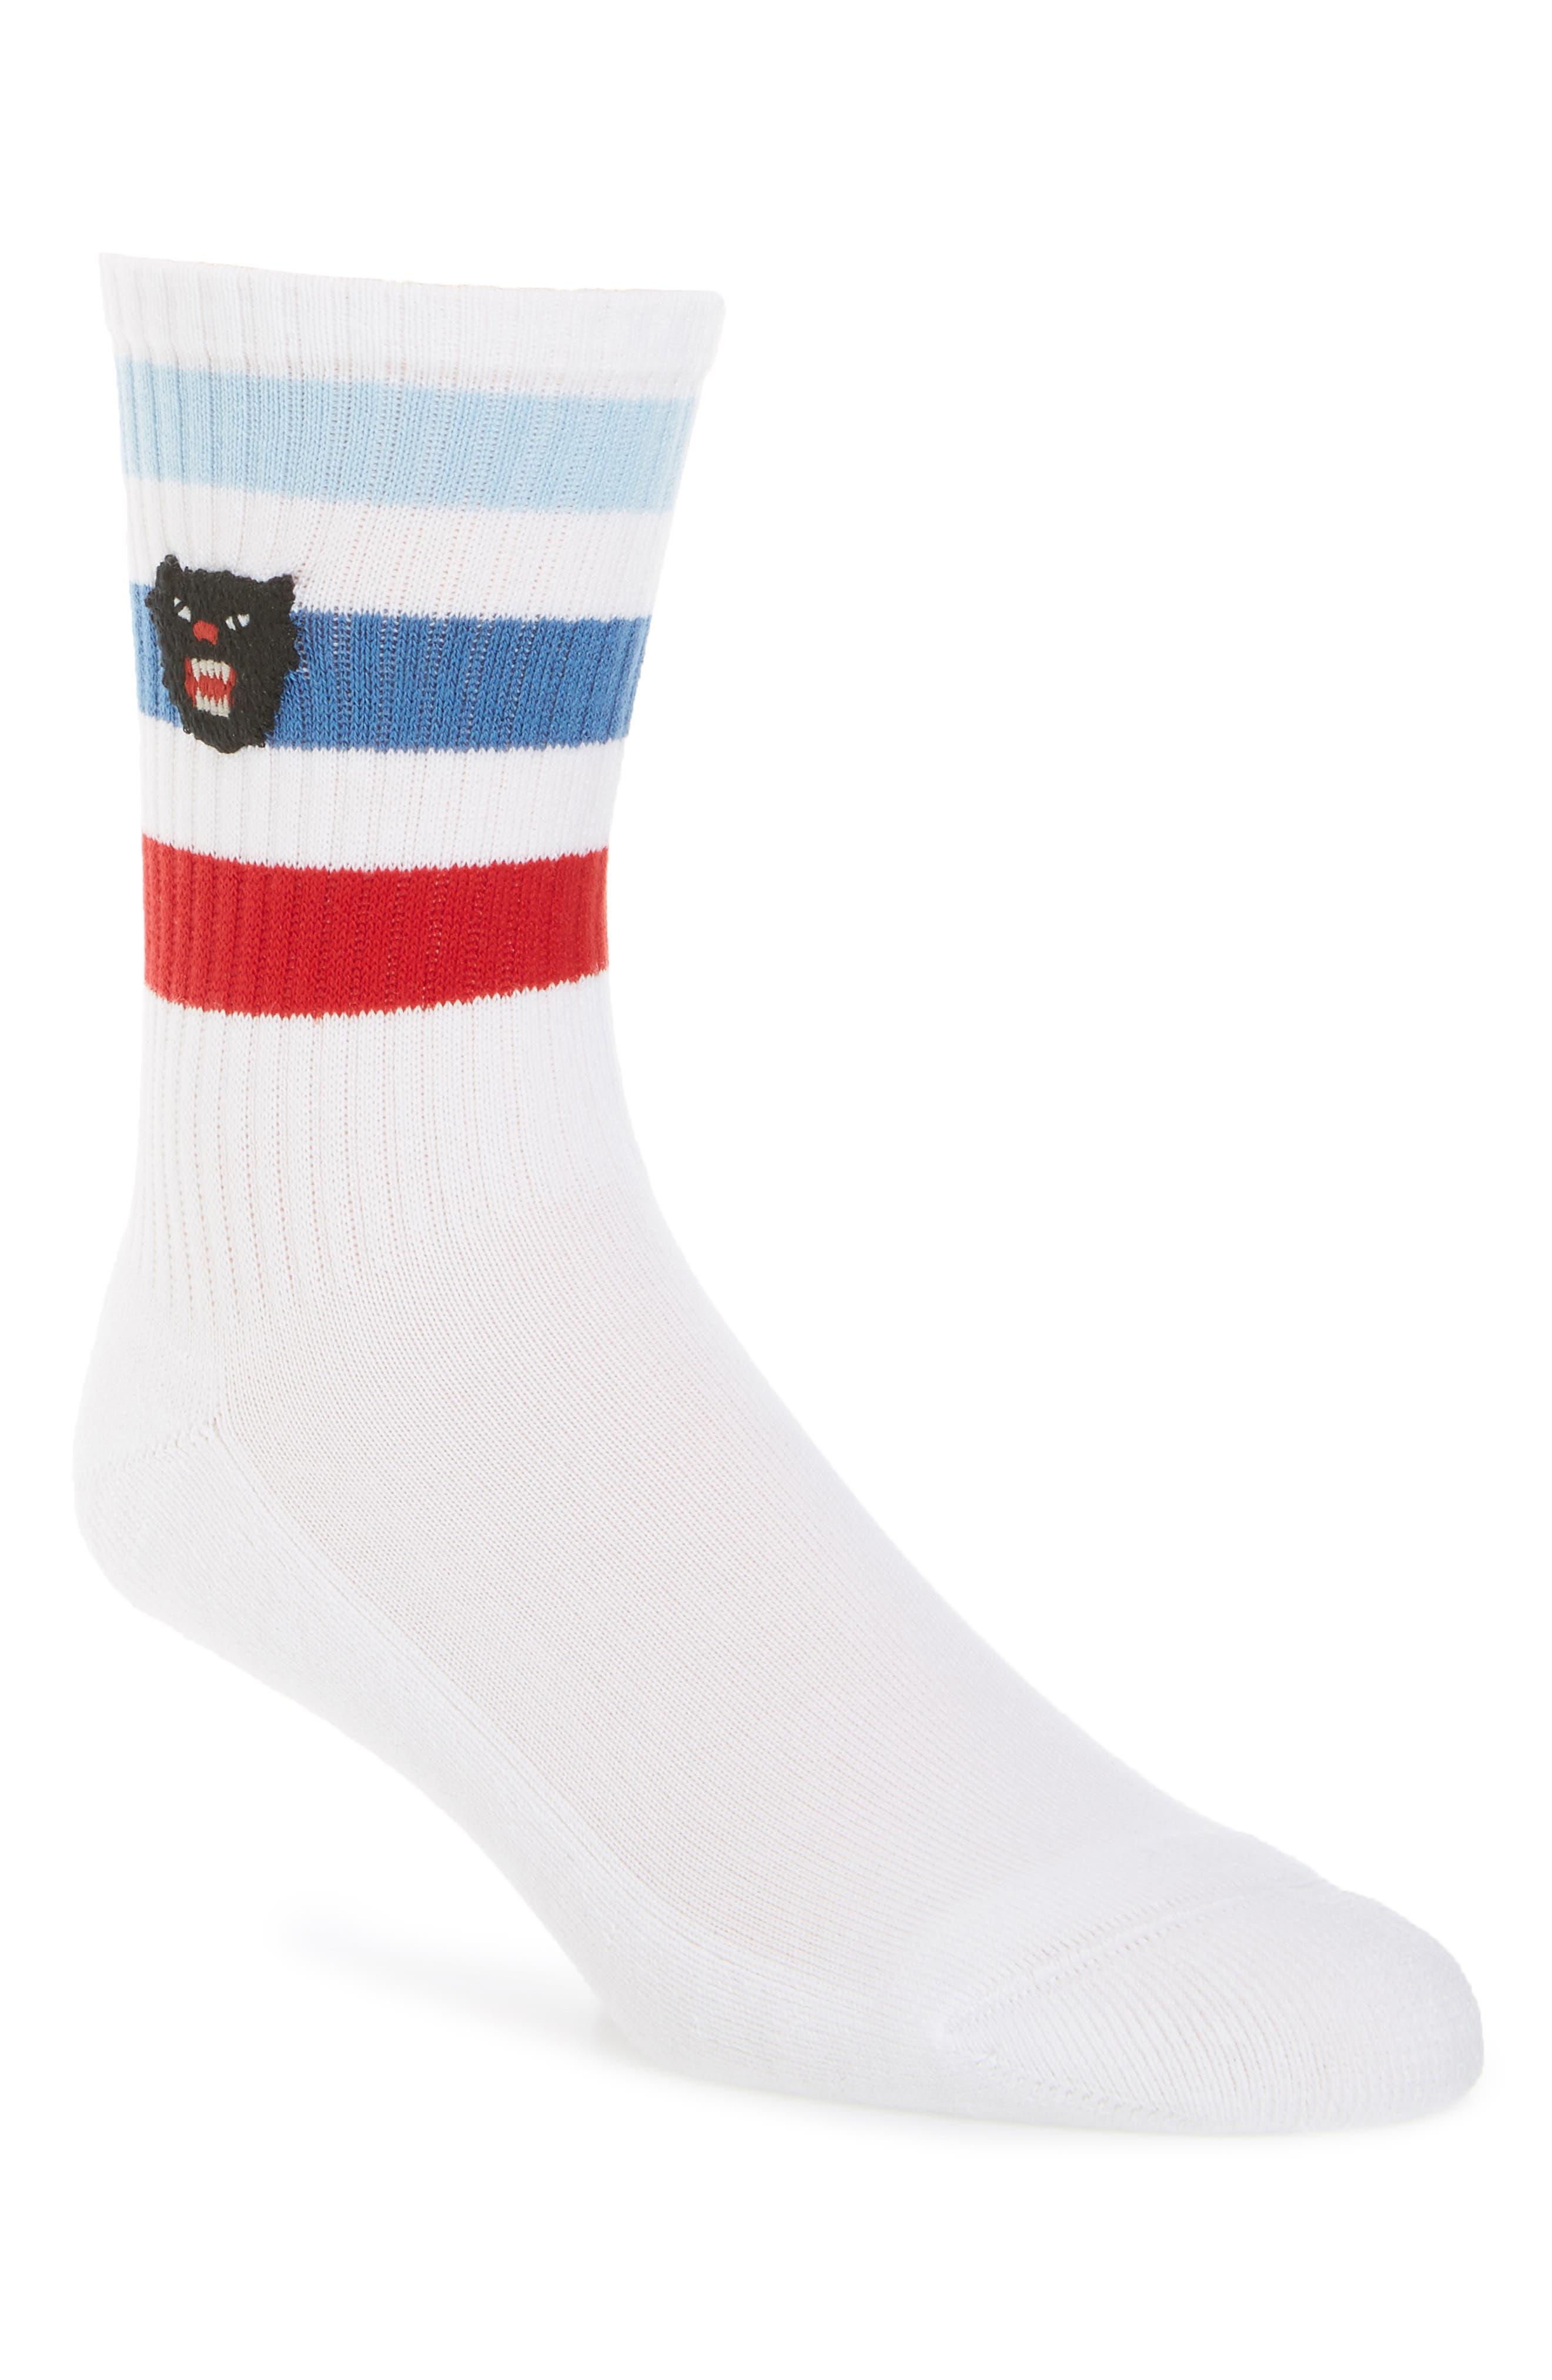 Main Image - Gucci Puma Patch Socks